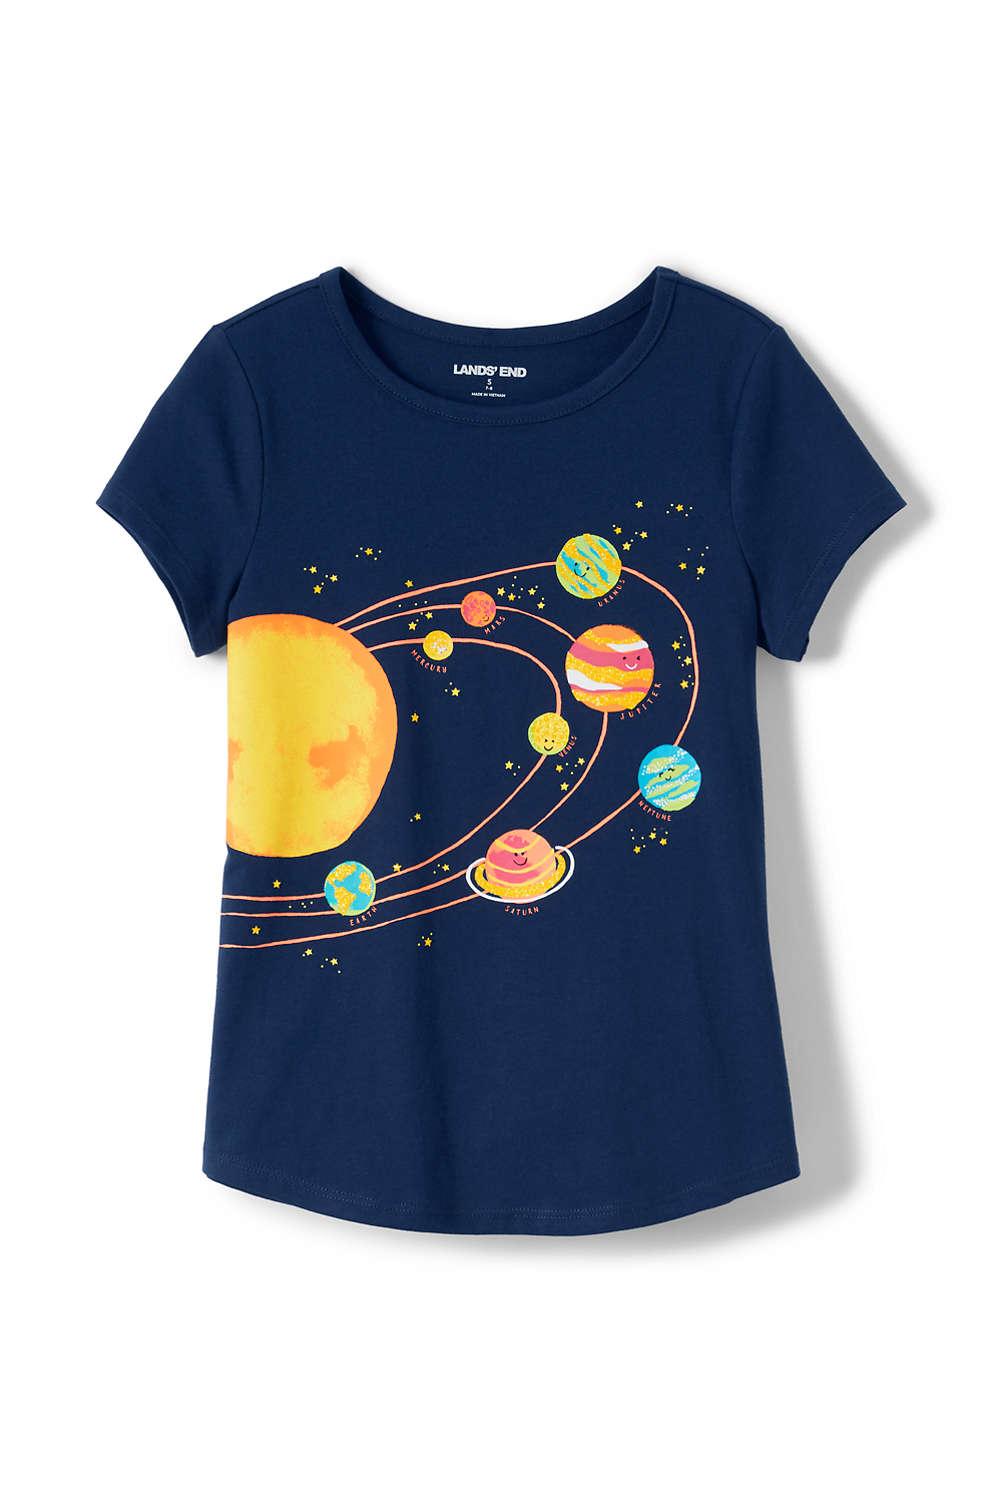 8fe40d1ec888 Ladies graphic tee shirts